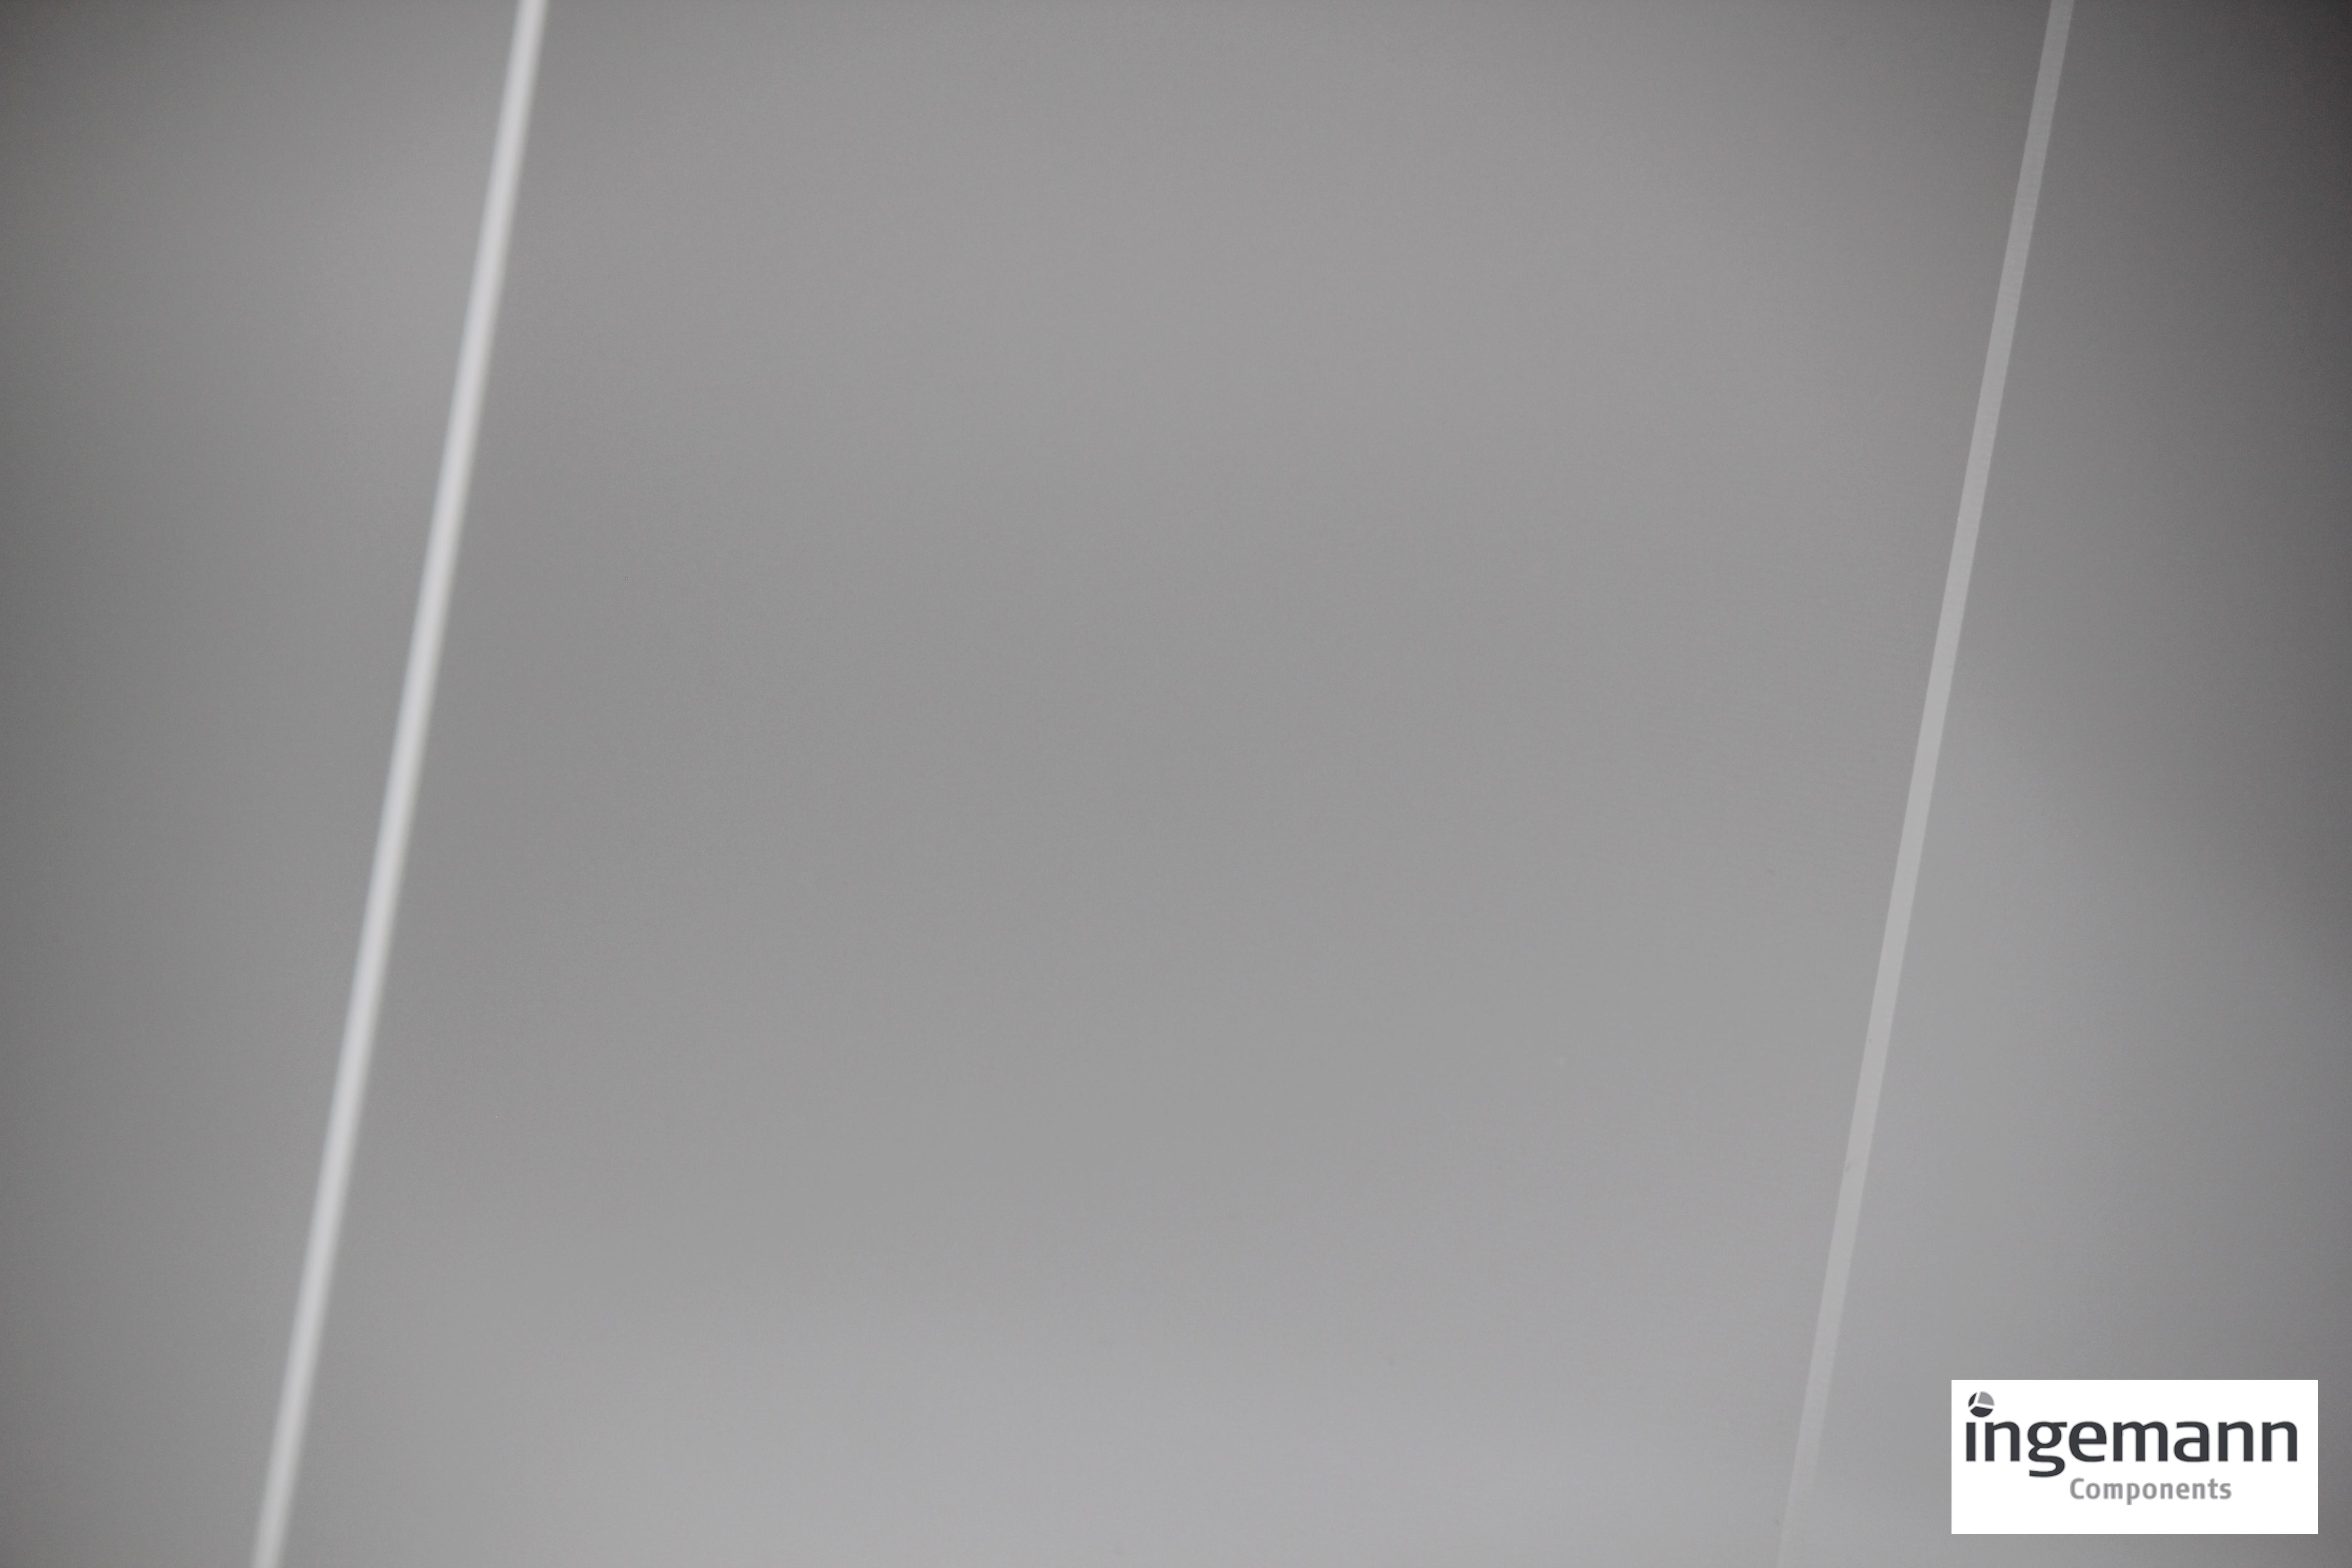 Ingemann Linear LGP - Ingemann Components